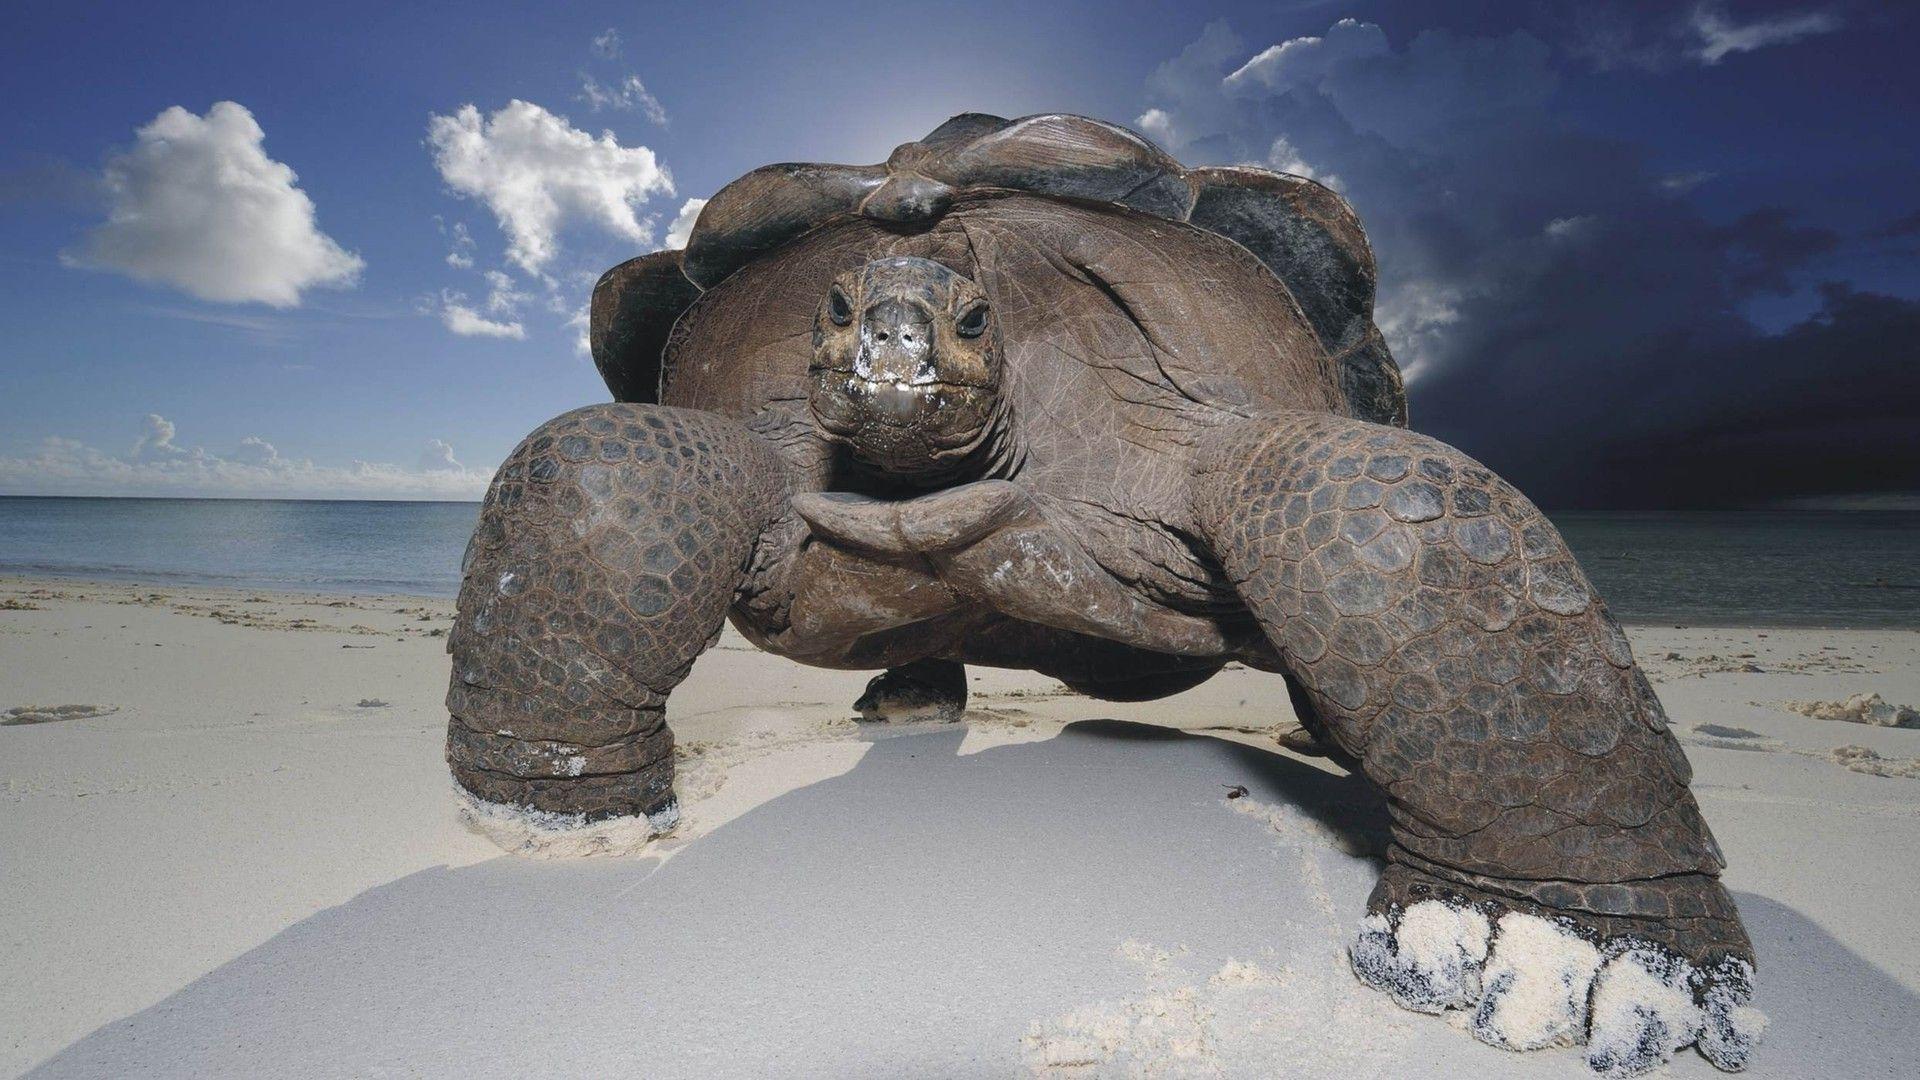 A Huge Turtle